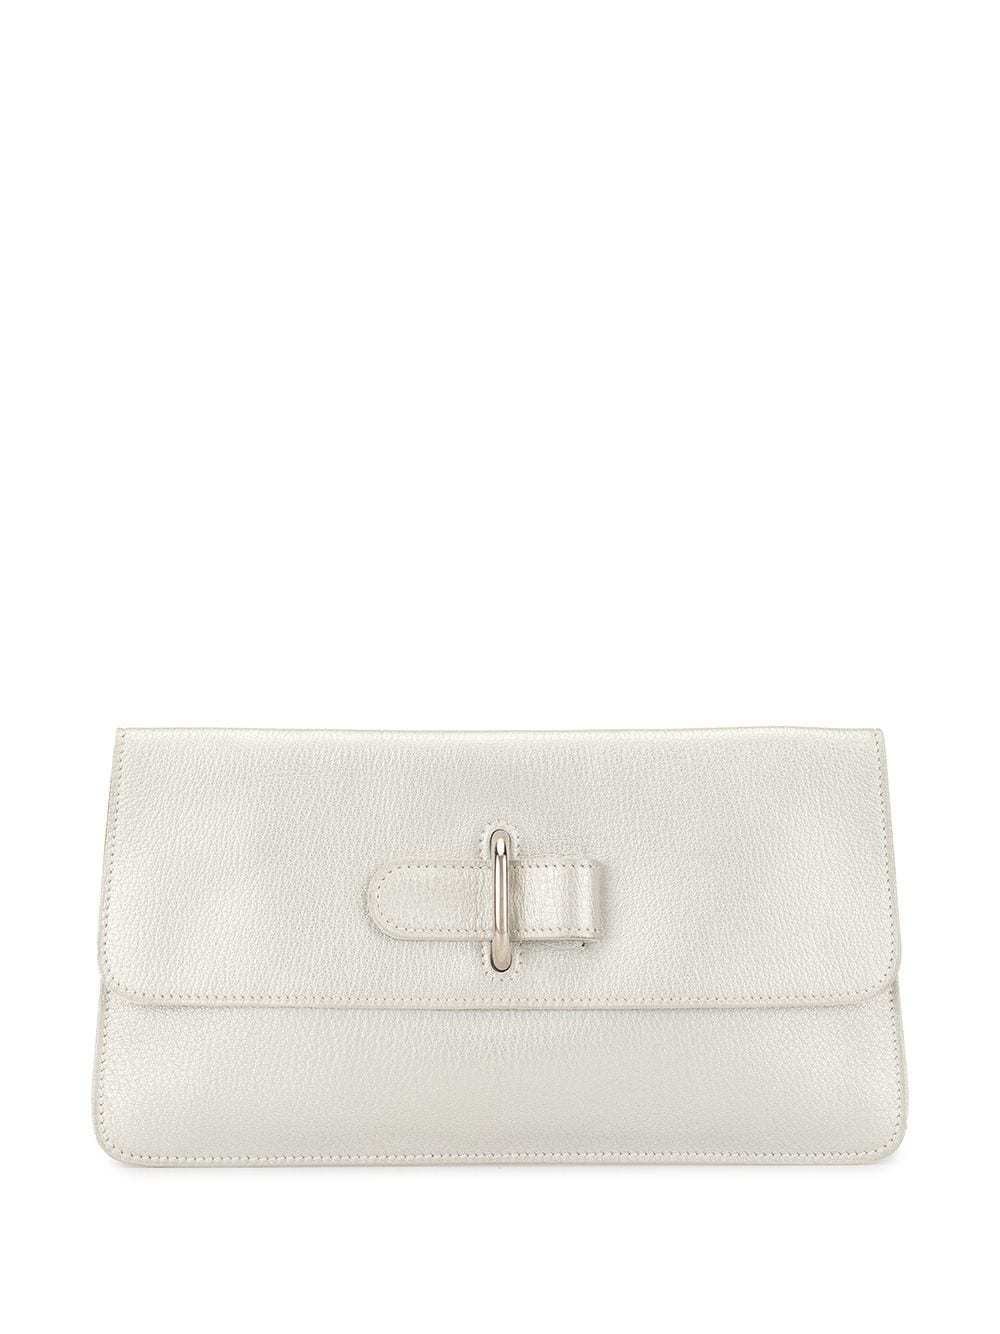 Hermès Pre-owned Clutch mit Schnalle - Silber